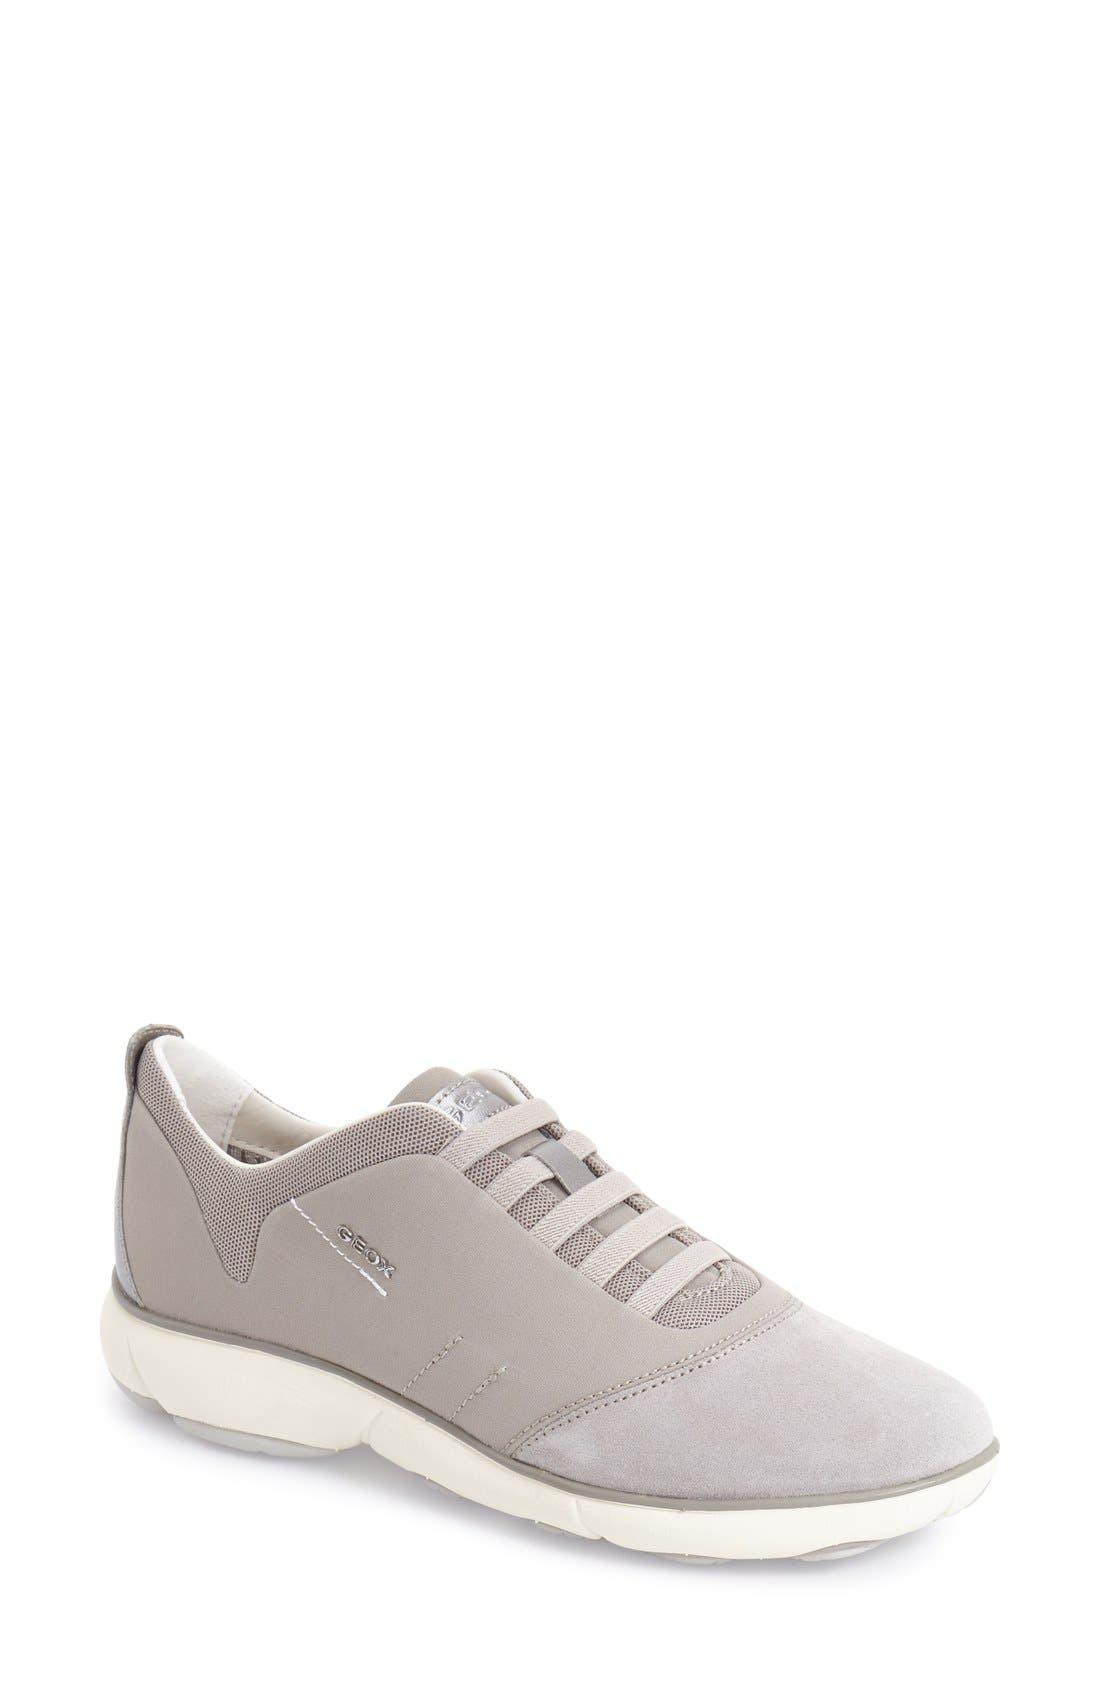 GEOX Nebula Sneaker, Main, color, 050